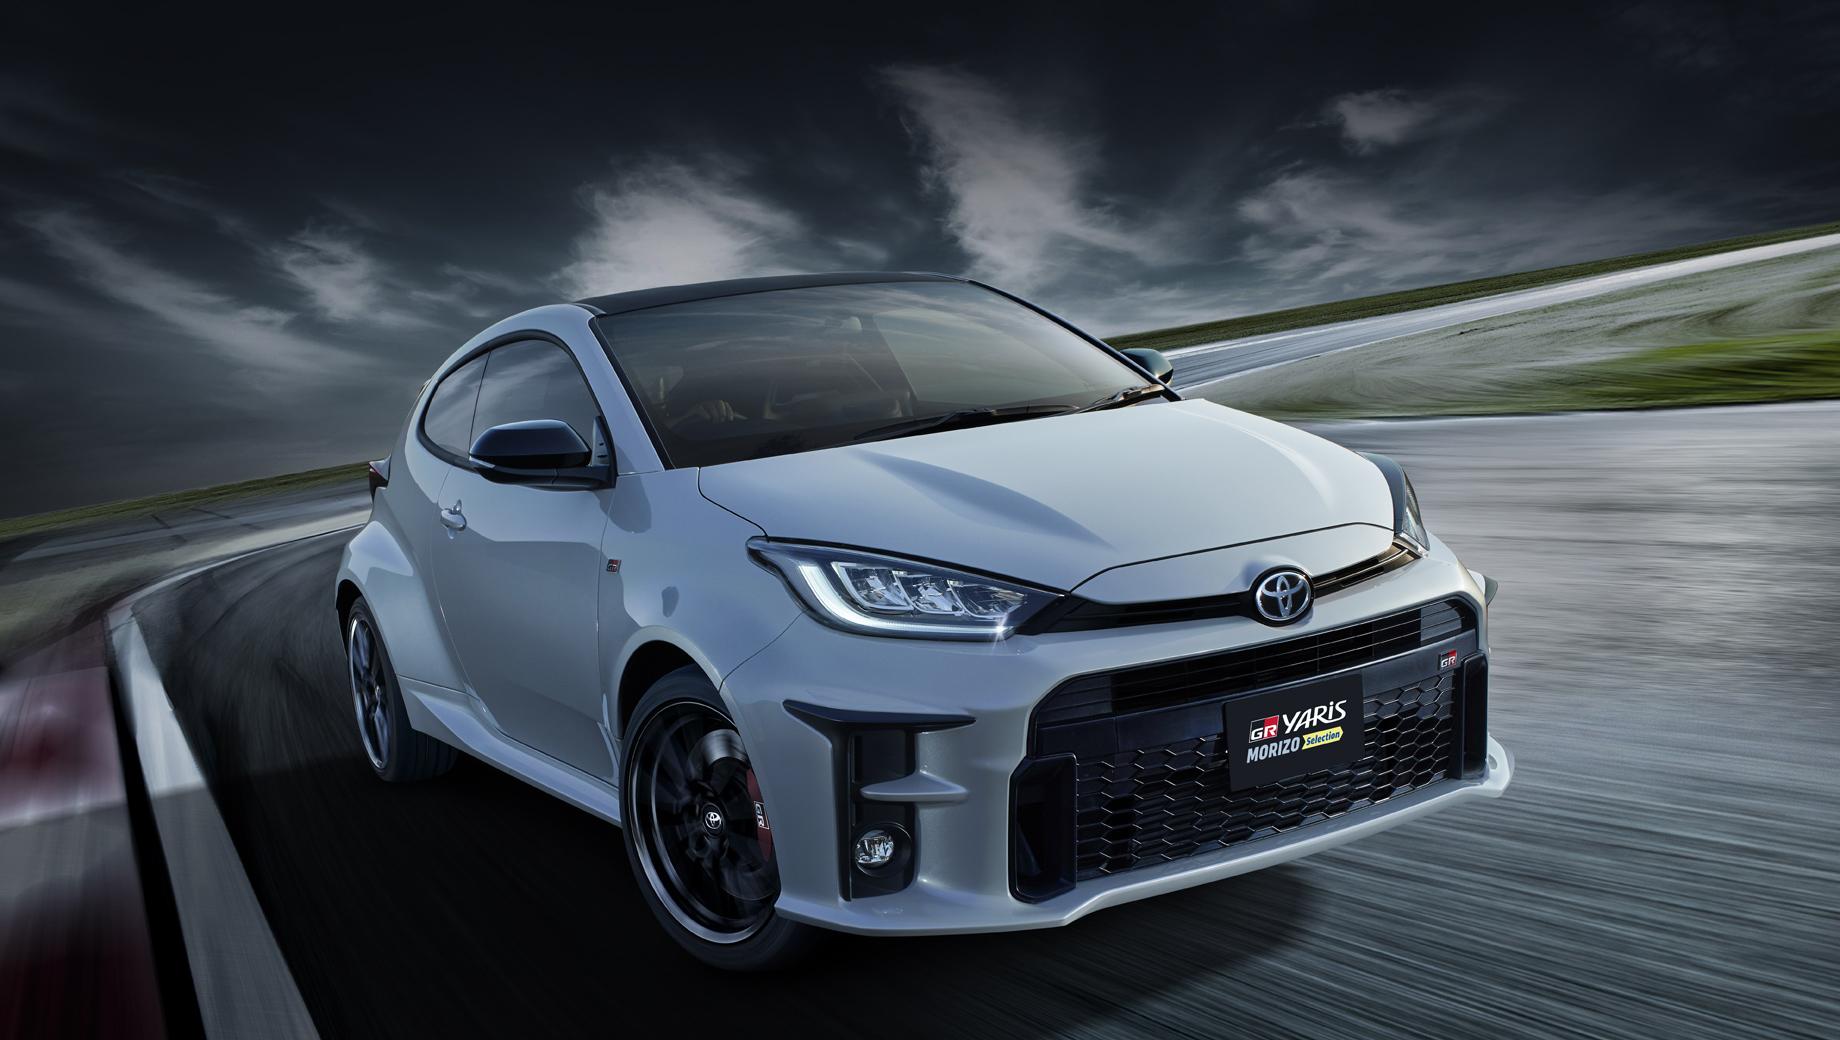 Toyota GR Yaris Morizo Selection открыла тюнинг по подписке